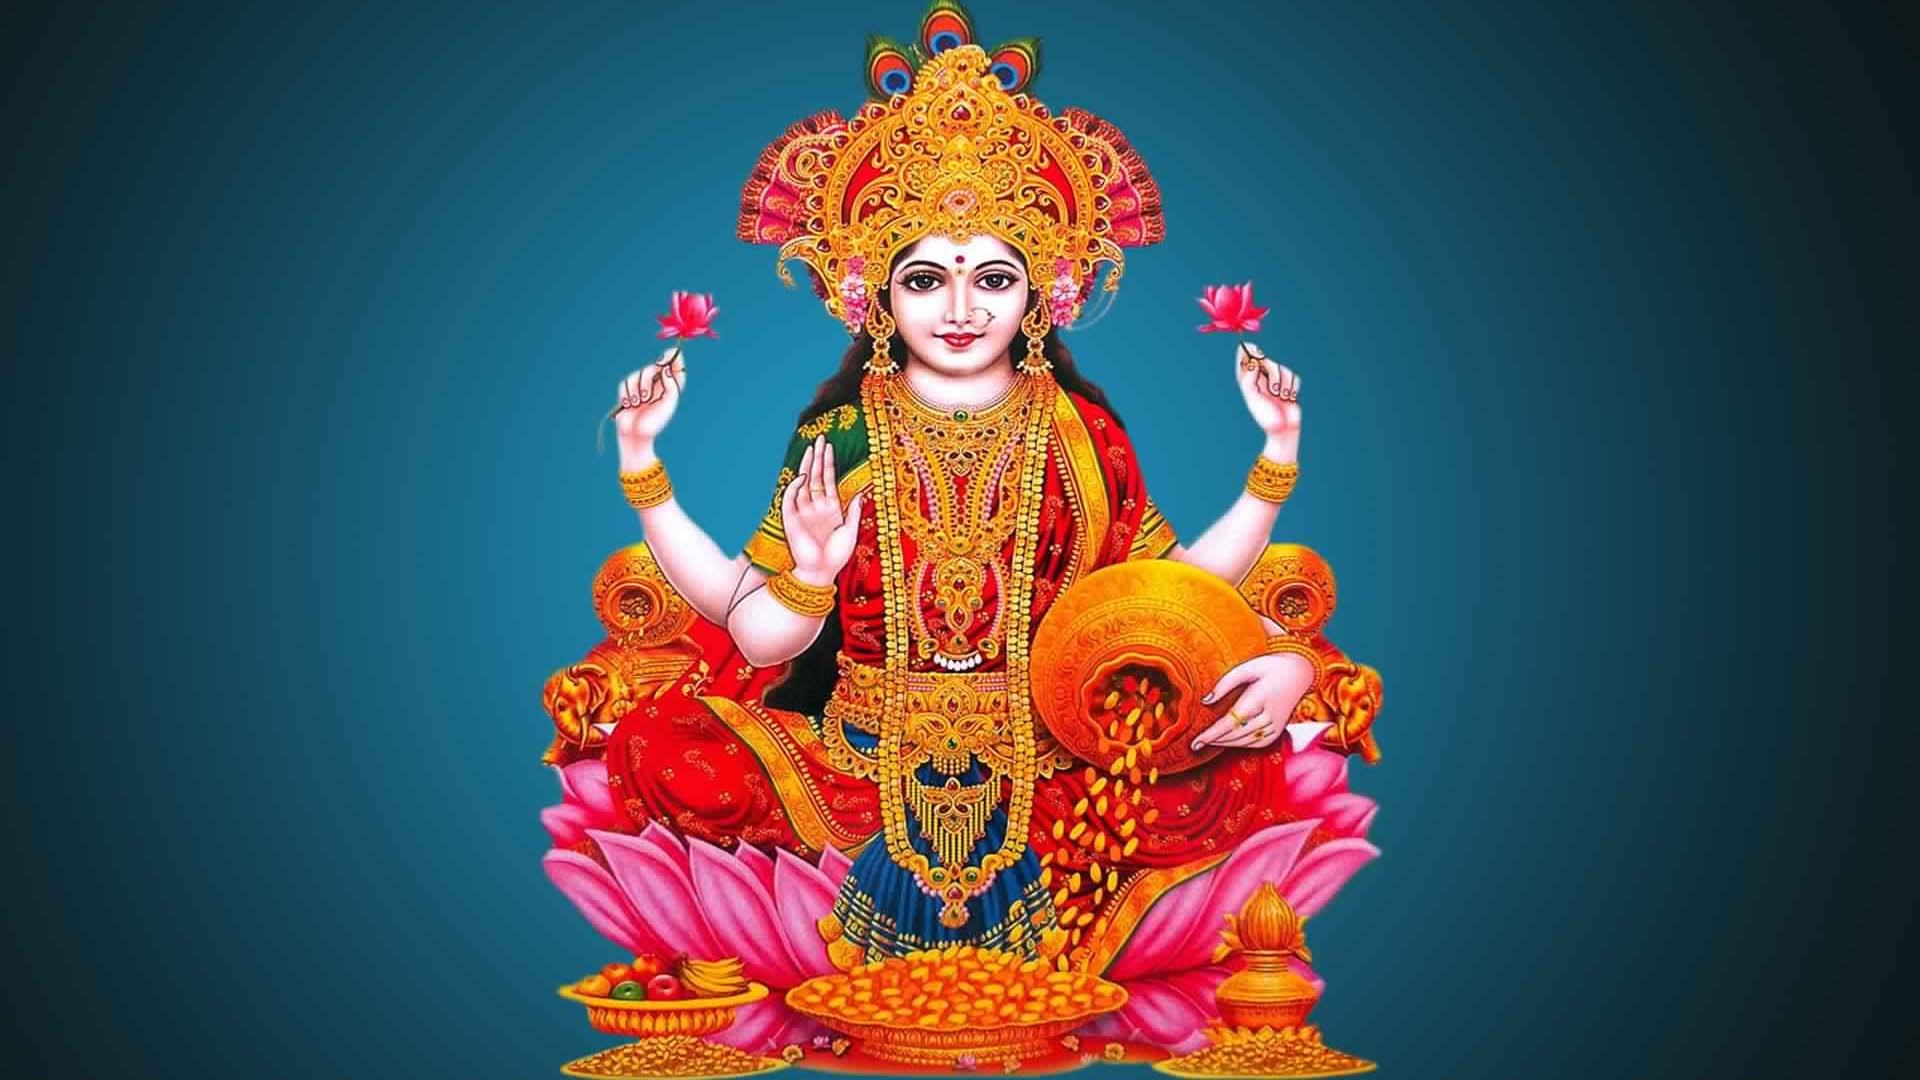 Goddess Lakshmi Photos High Resolution